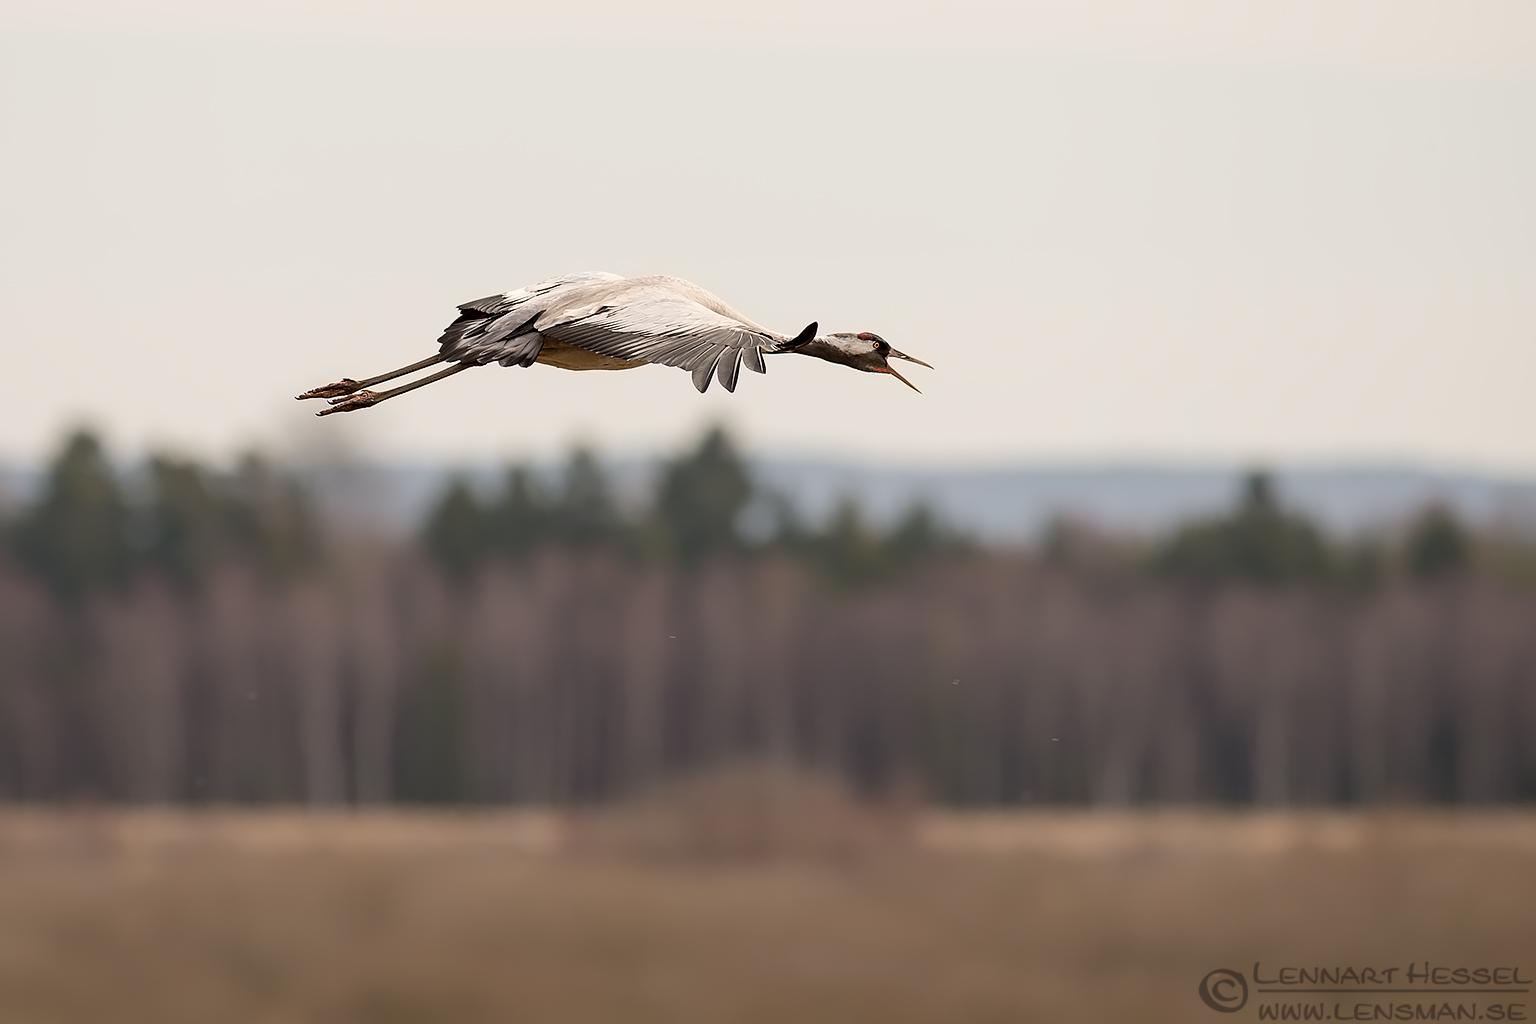 Calling Common Crane lekking